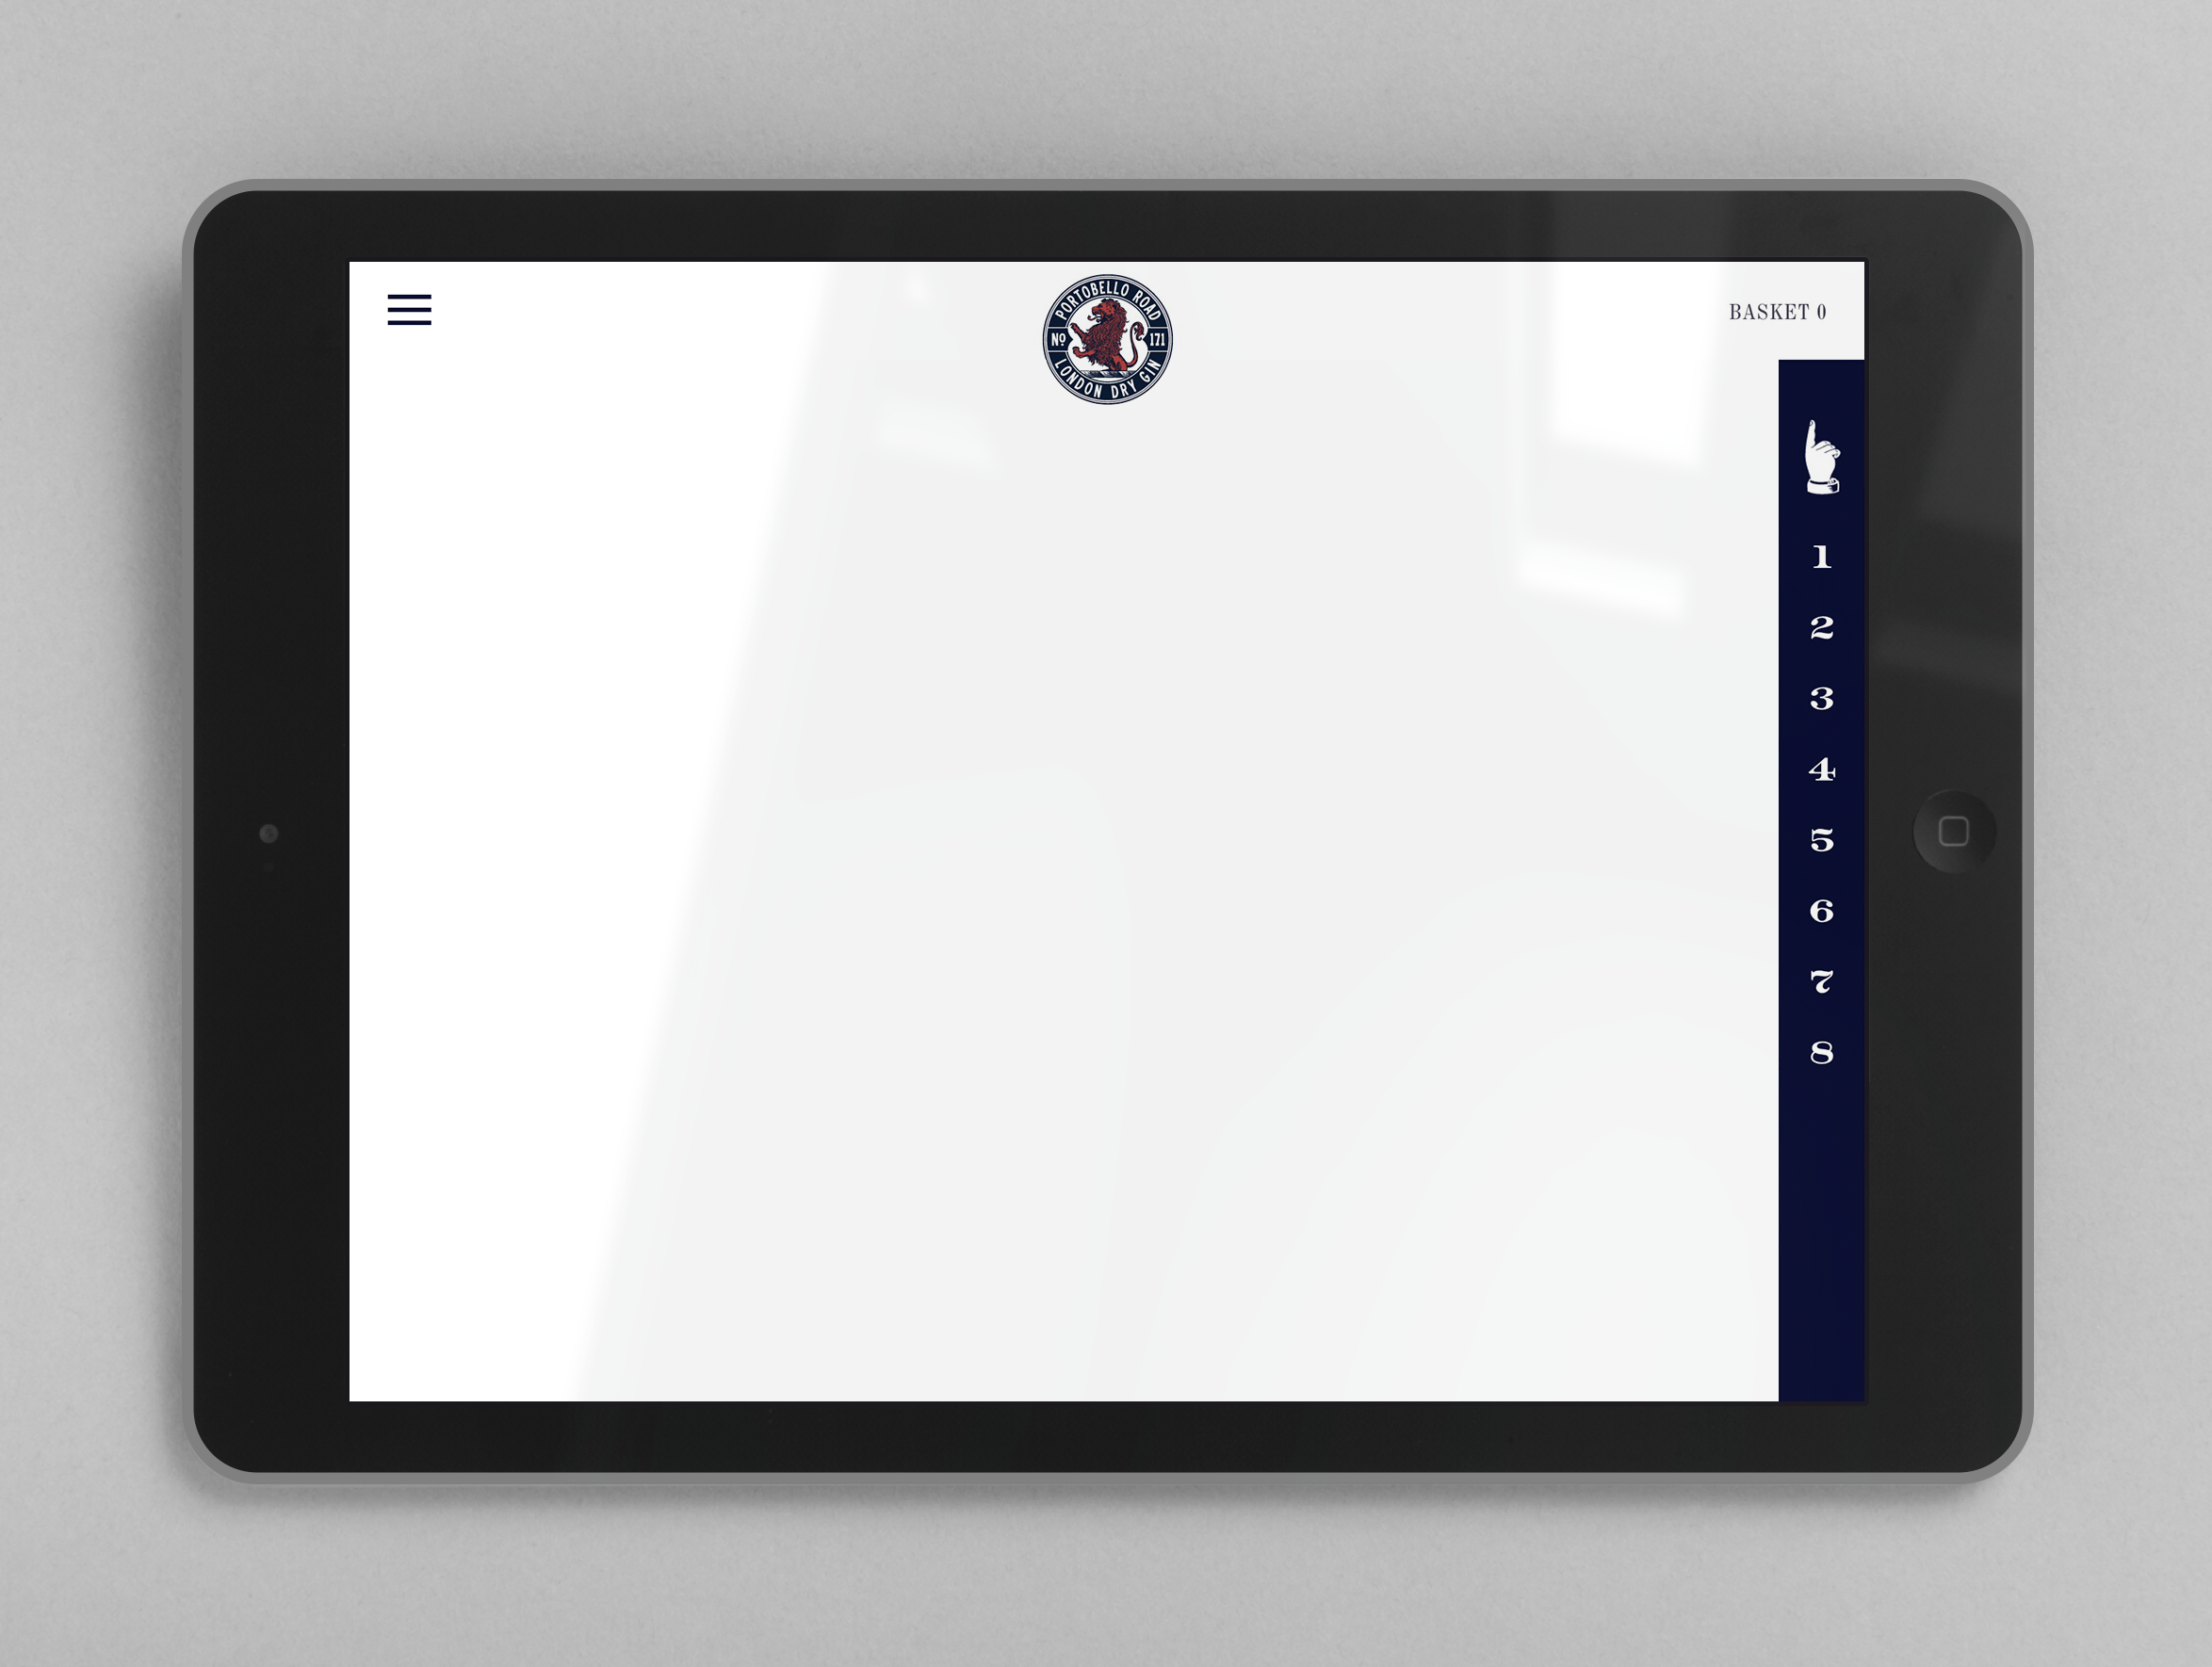 prg_ipad_frame1